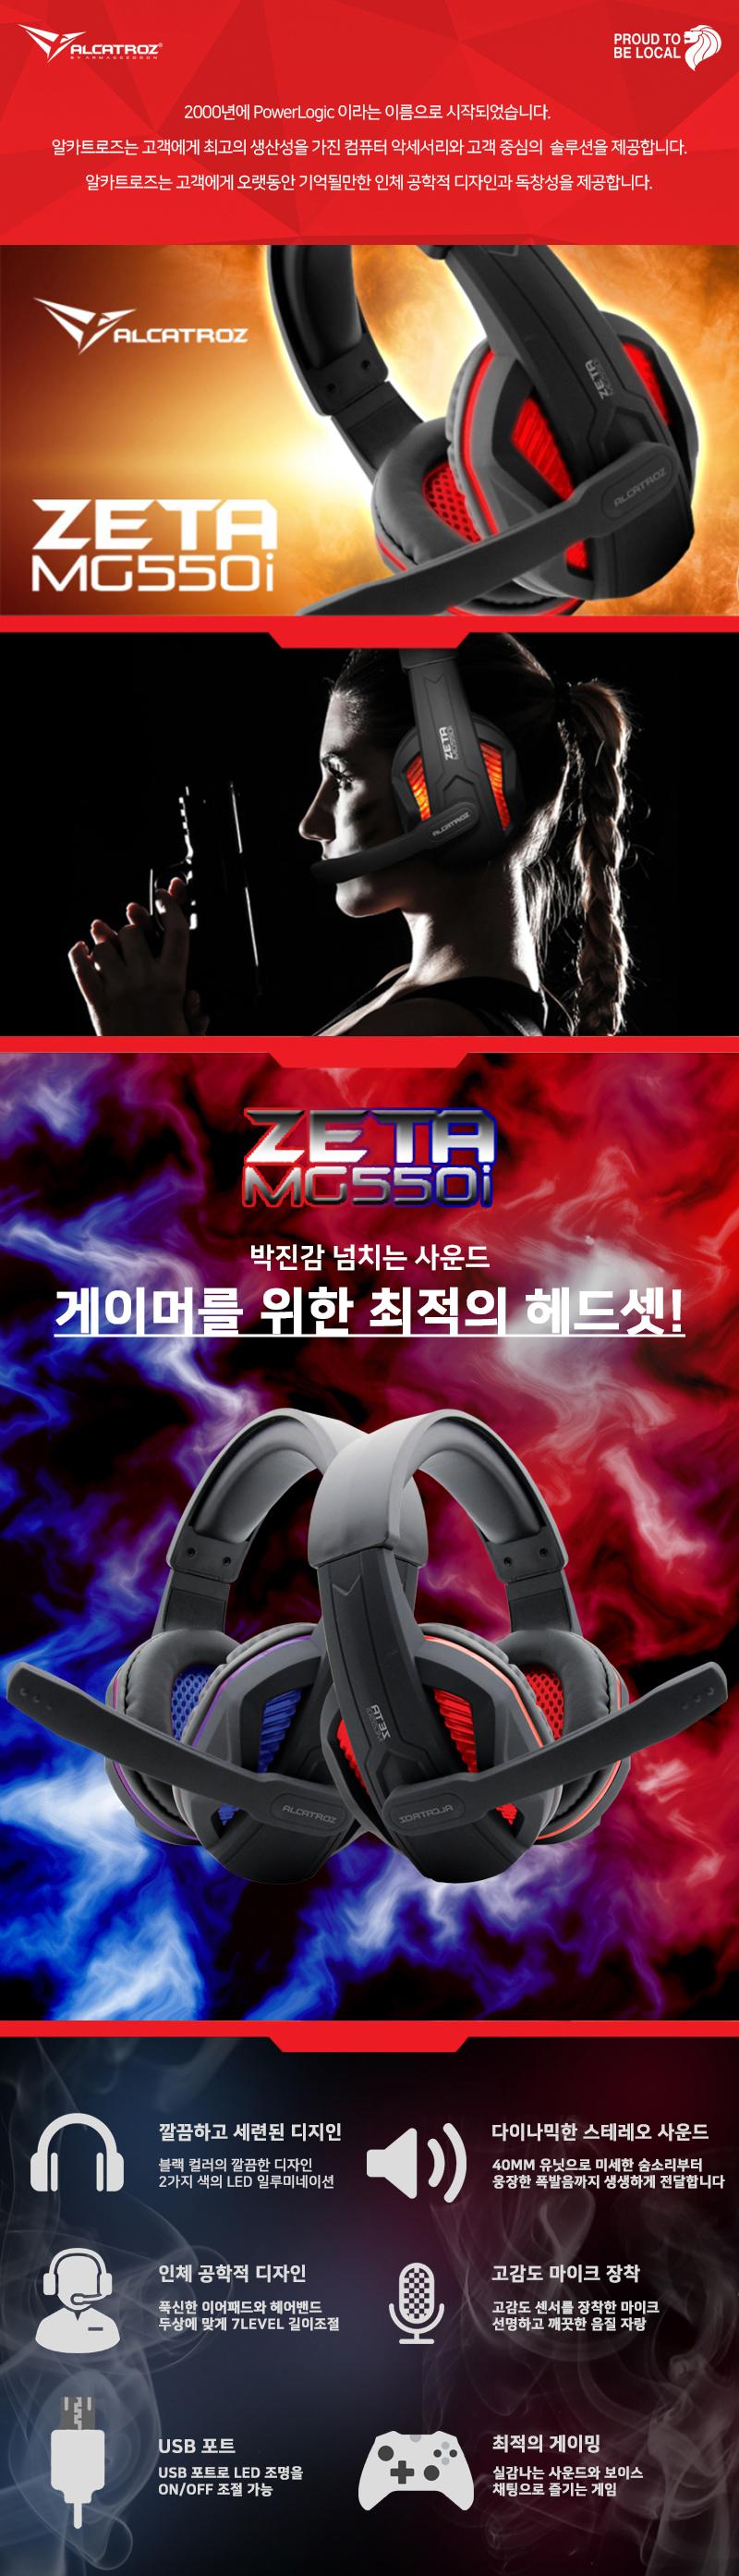 Alcatroz Zeta MG-550i Gaming Headset | Asianic Distributors Inc